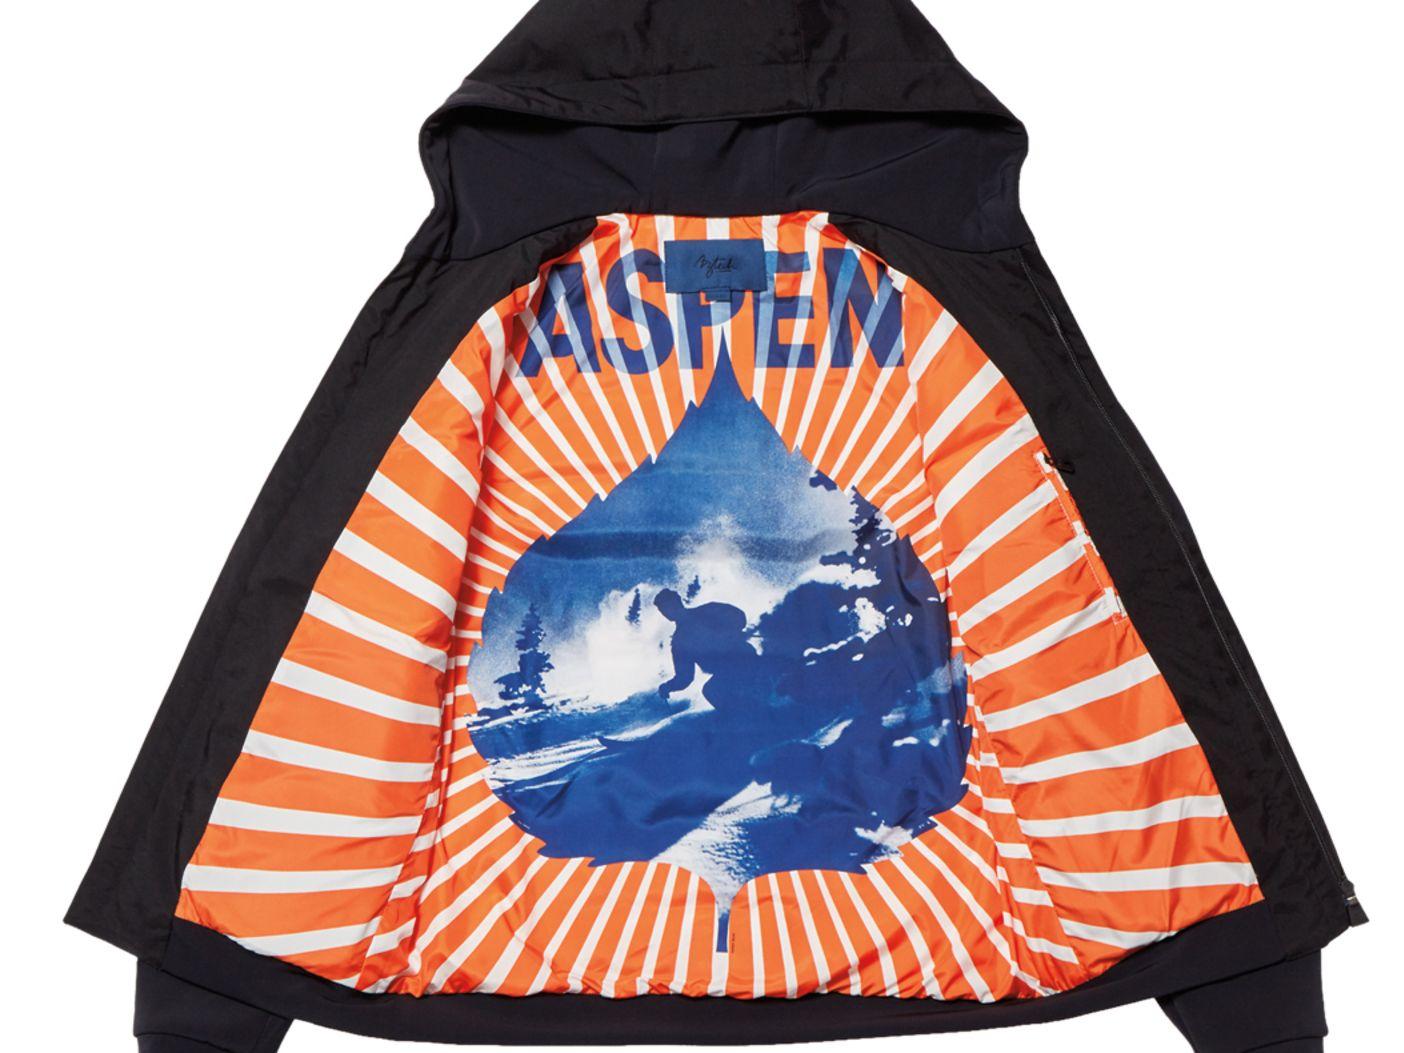 Hoodedblackjacket interior  1 ey5hfs